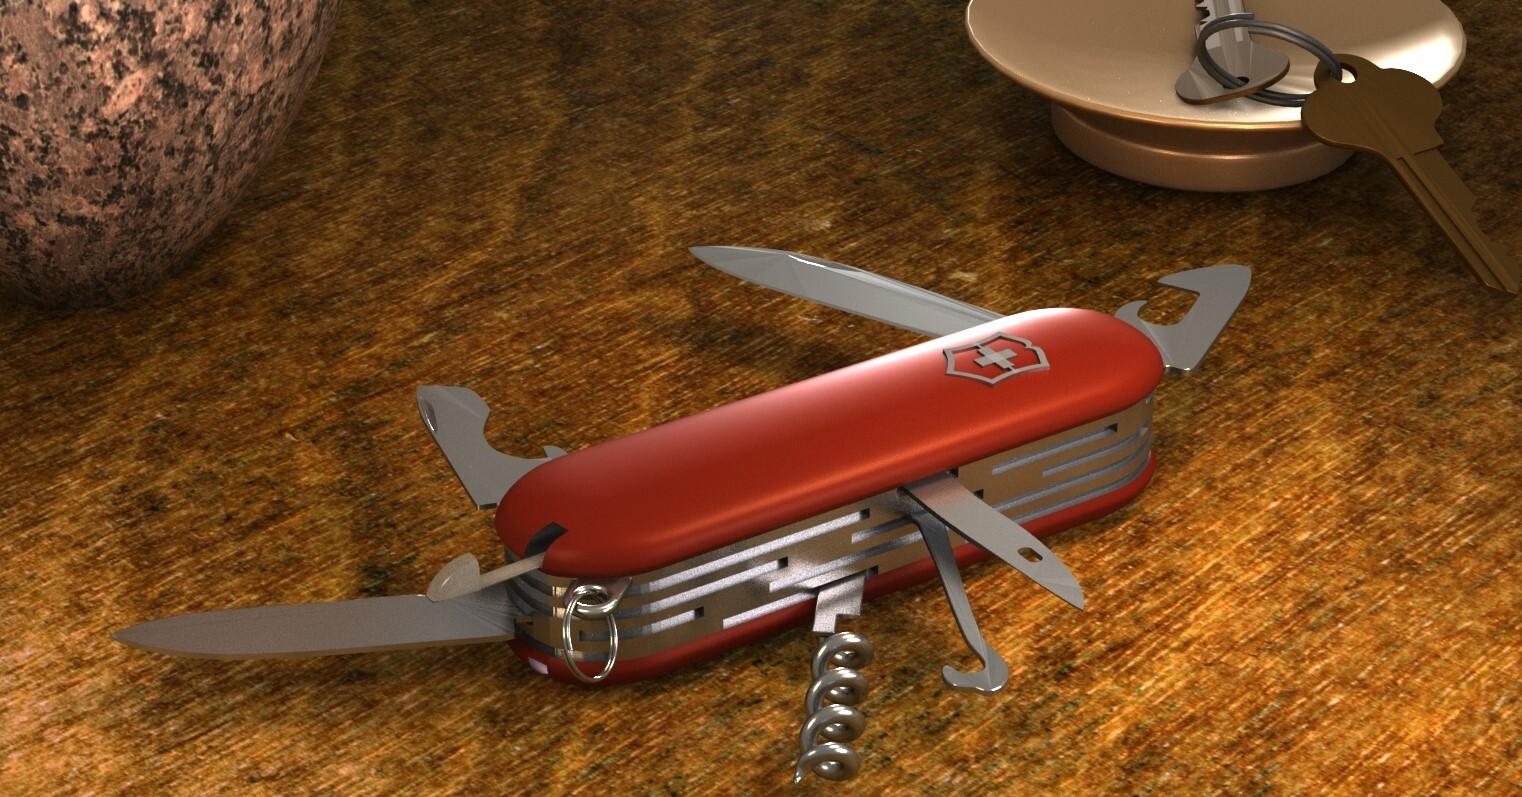 Fully rendered swiss army knife scene